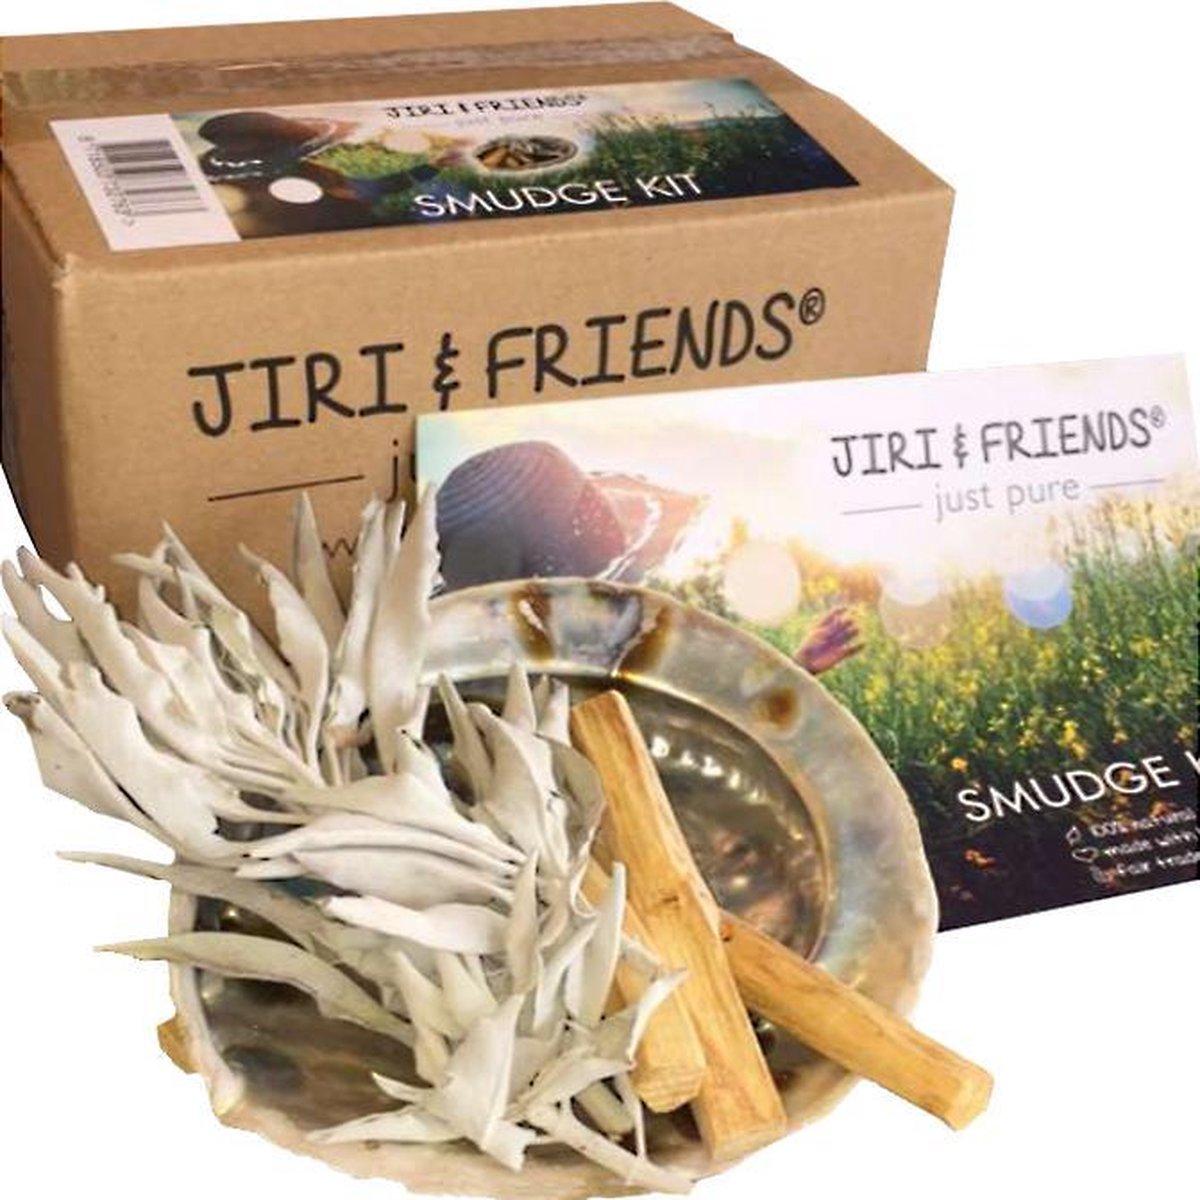 Reinig je Huis Pakket Jiri Friends - Smudgekit Witte Salie - Palo Santo Sticks - Abalone Schelp - Jiri & Friends